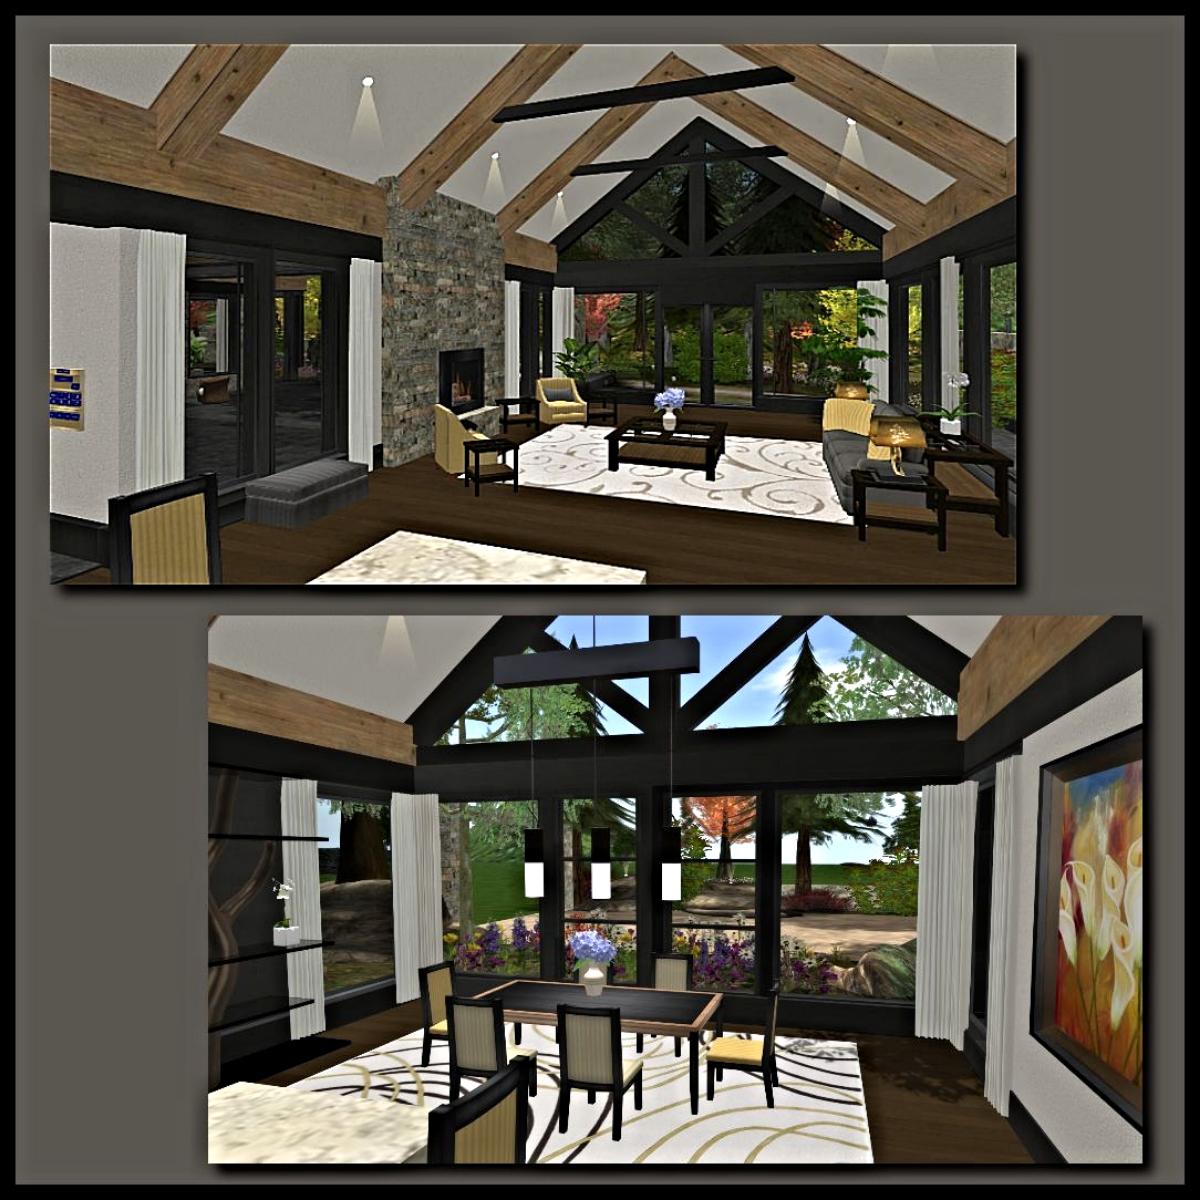 Dream House Interior.jpg